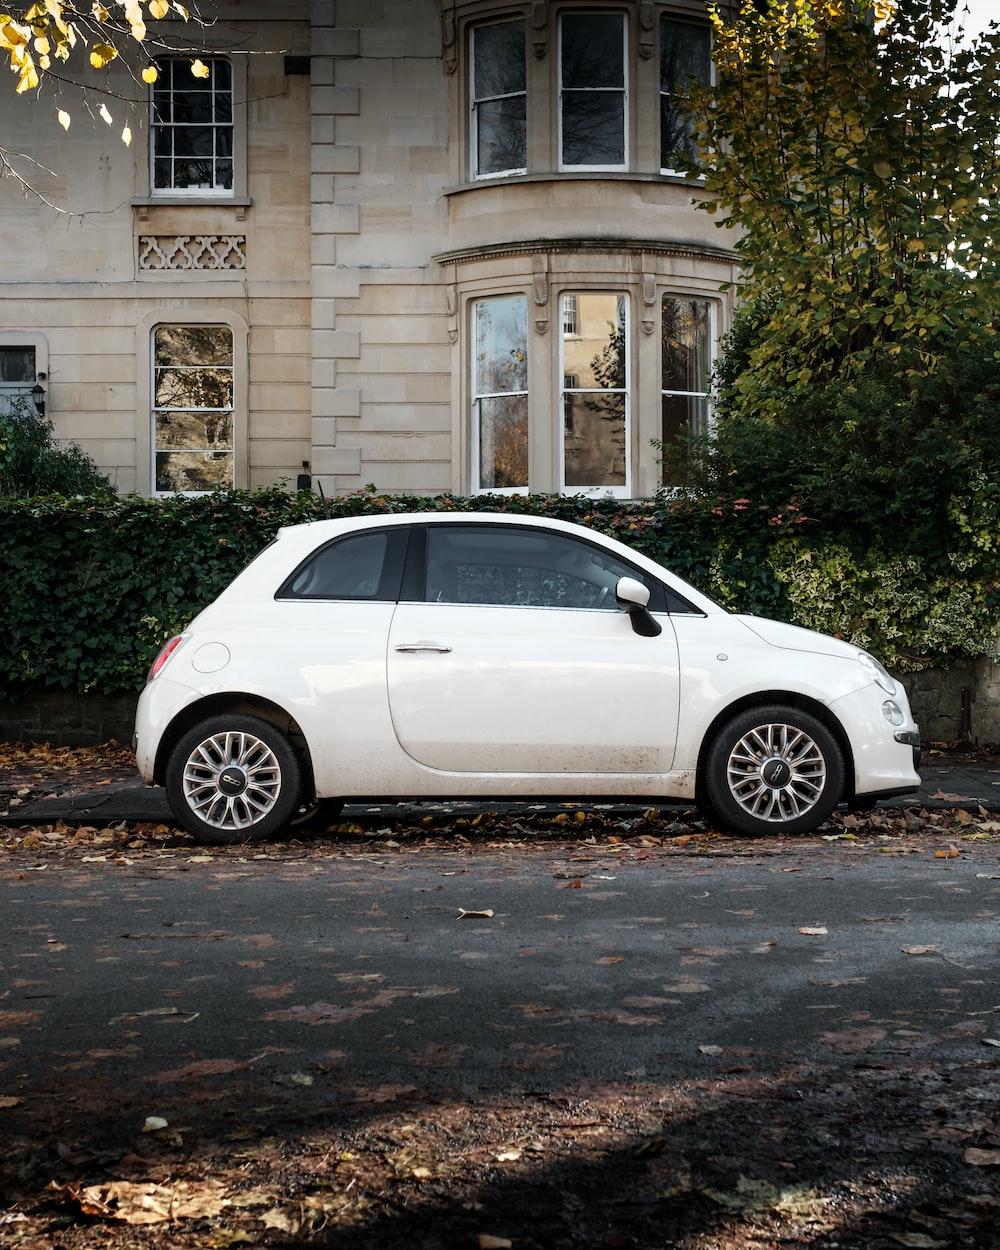 white 5 door hatchback parked beside brown concrete building during daytime